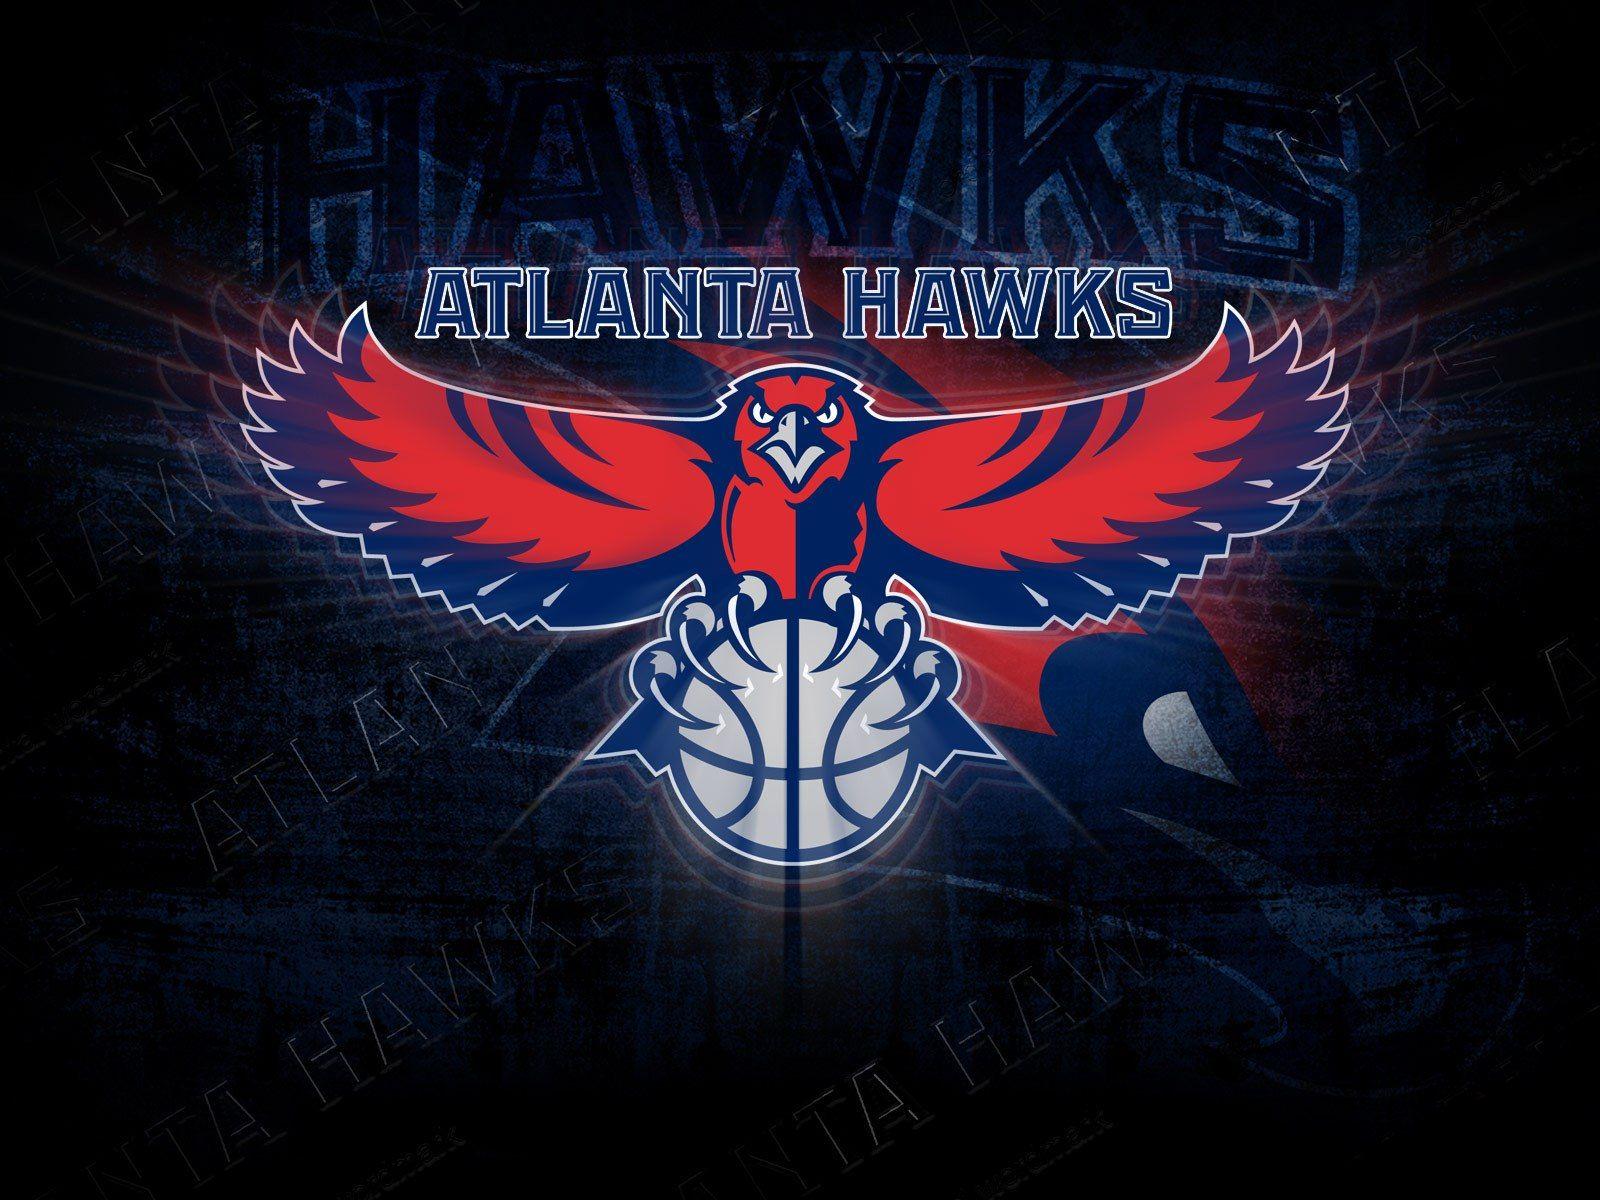 Atlanta hawks logo lets go hawks pinterest nba atlanta hawks logo buycottarizona